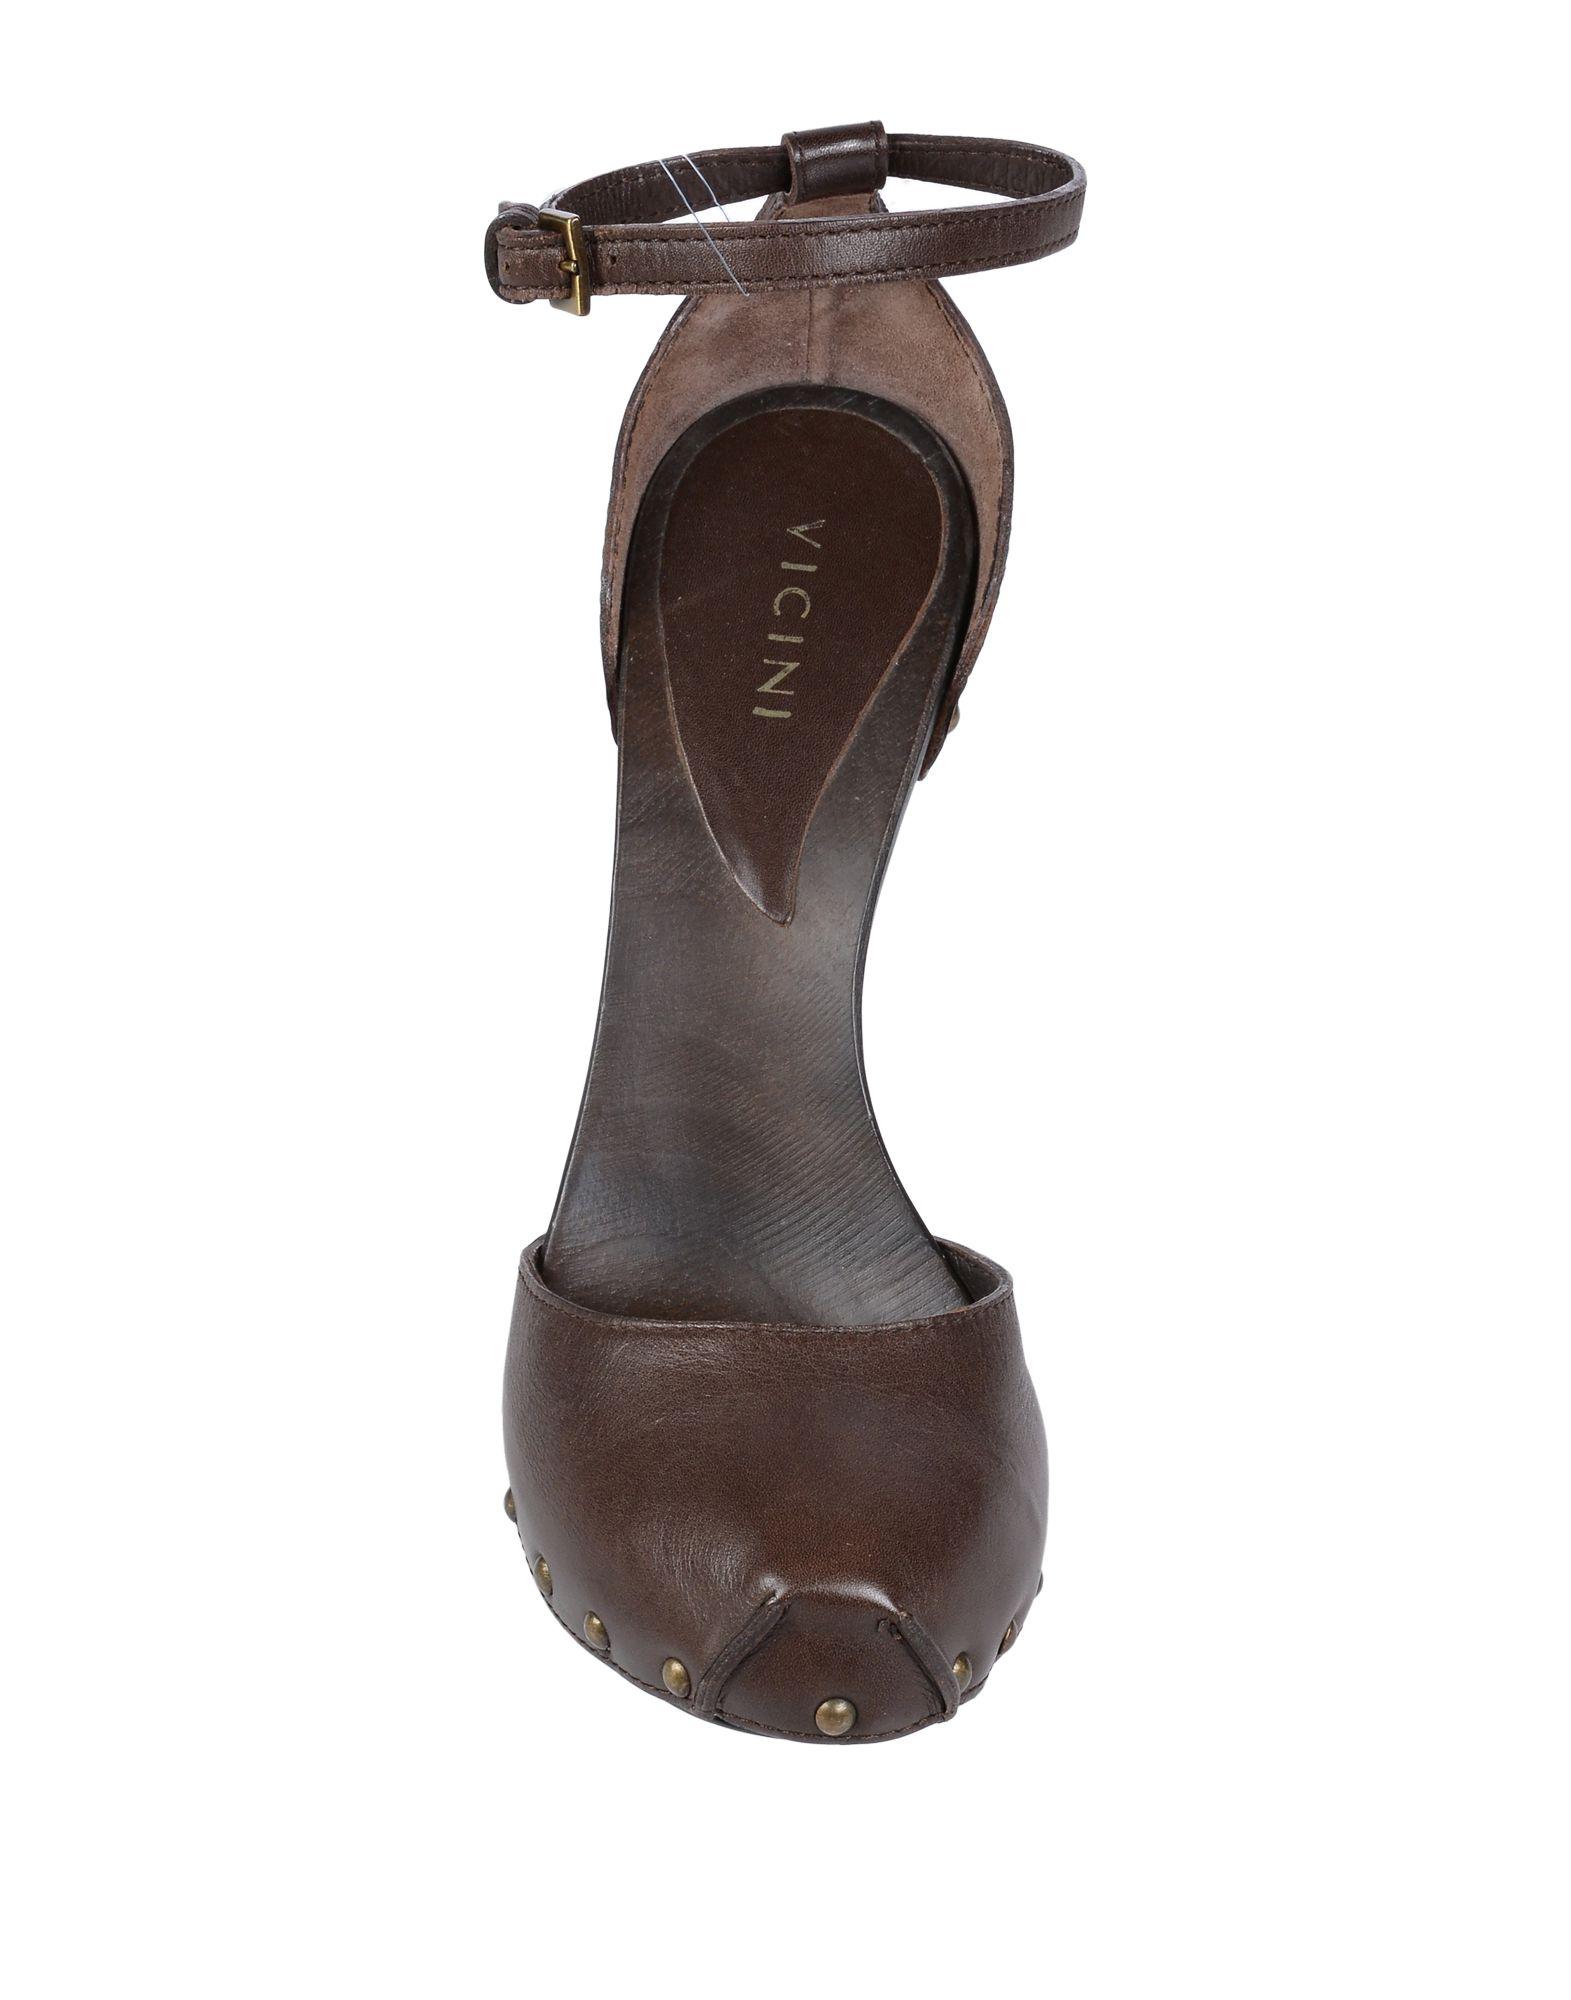 Stilvolle billige Schuhe Damen Vicini Sandalen Damen Schuhe  11522139JM 7b9cab